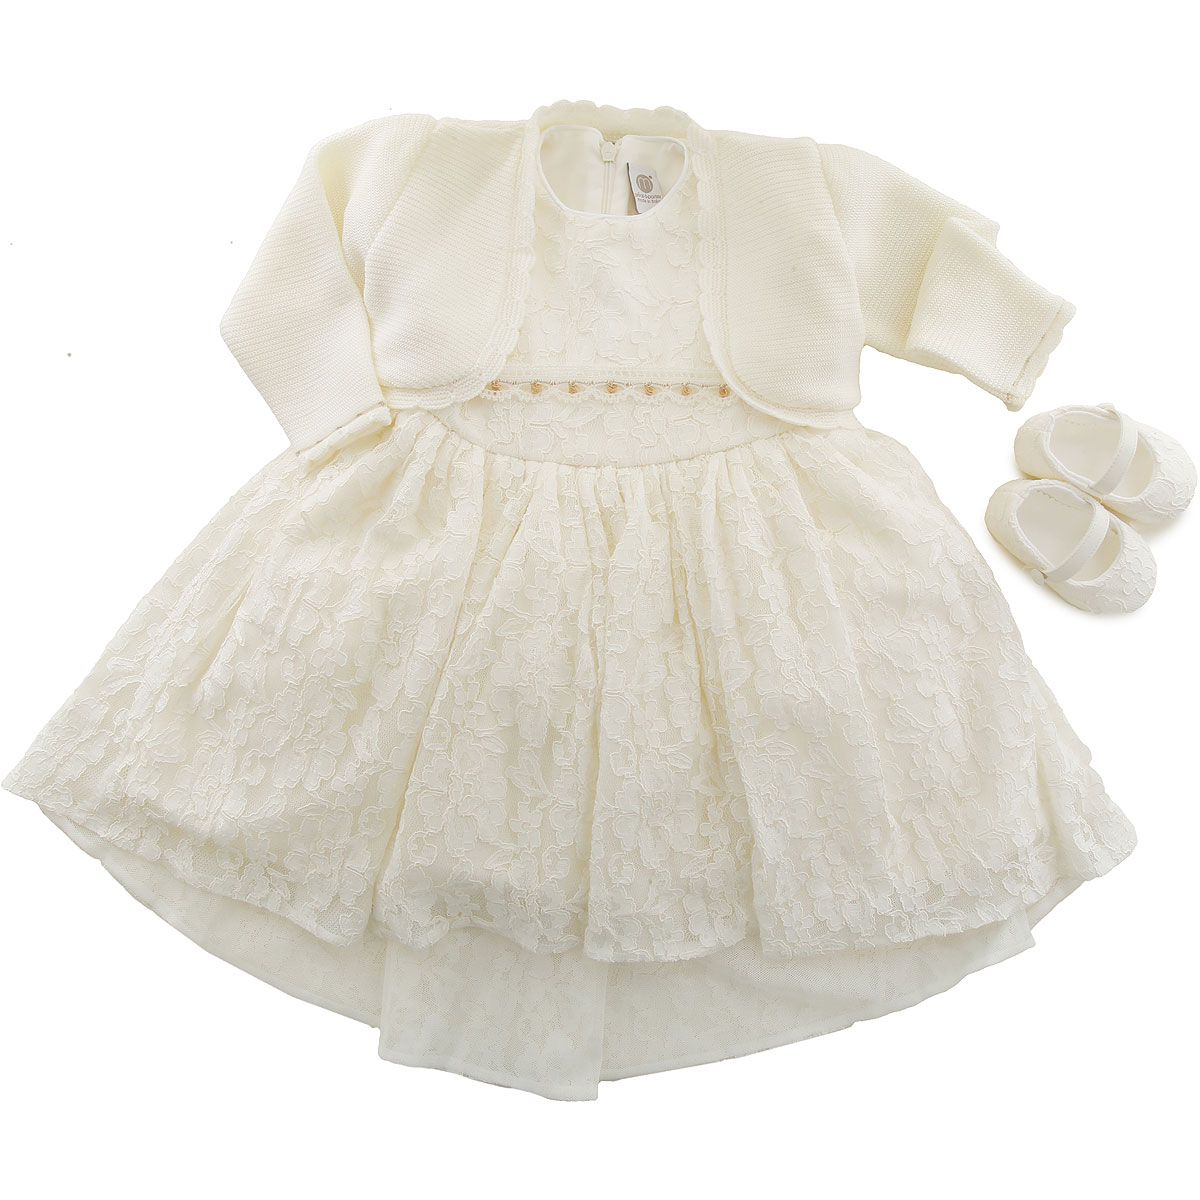 Marlu Baby Sets for Girls On Sale, Cream, Viscose, 2019, 12M 9M